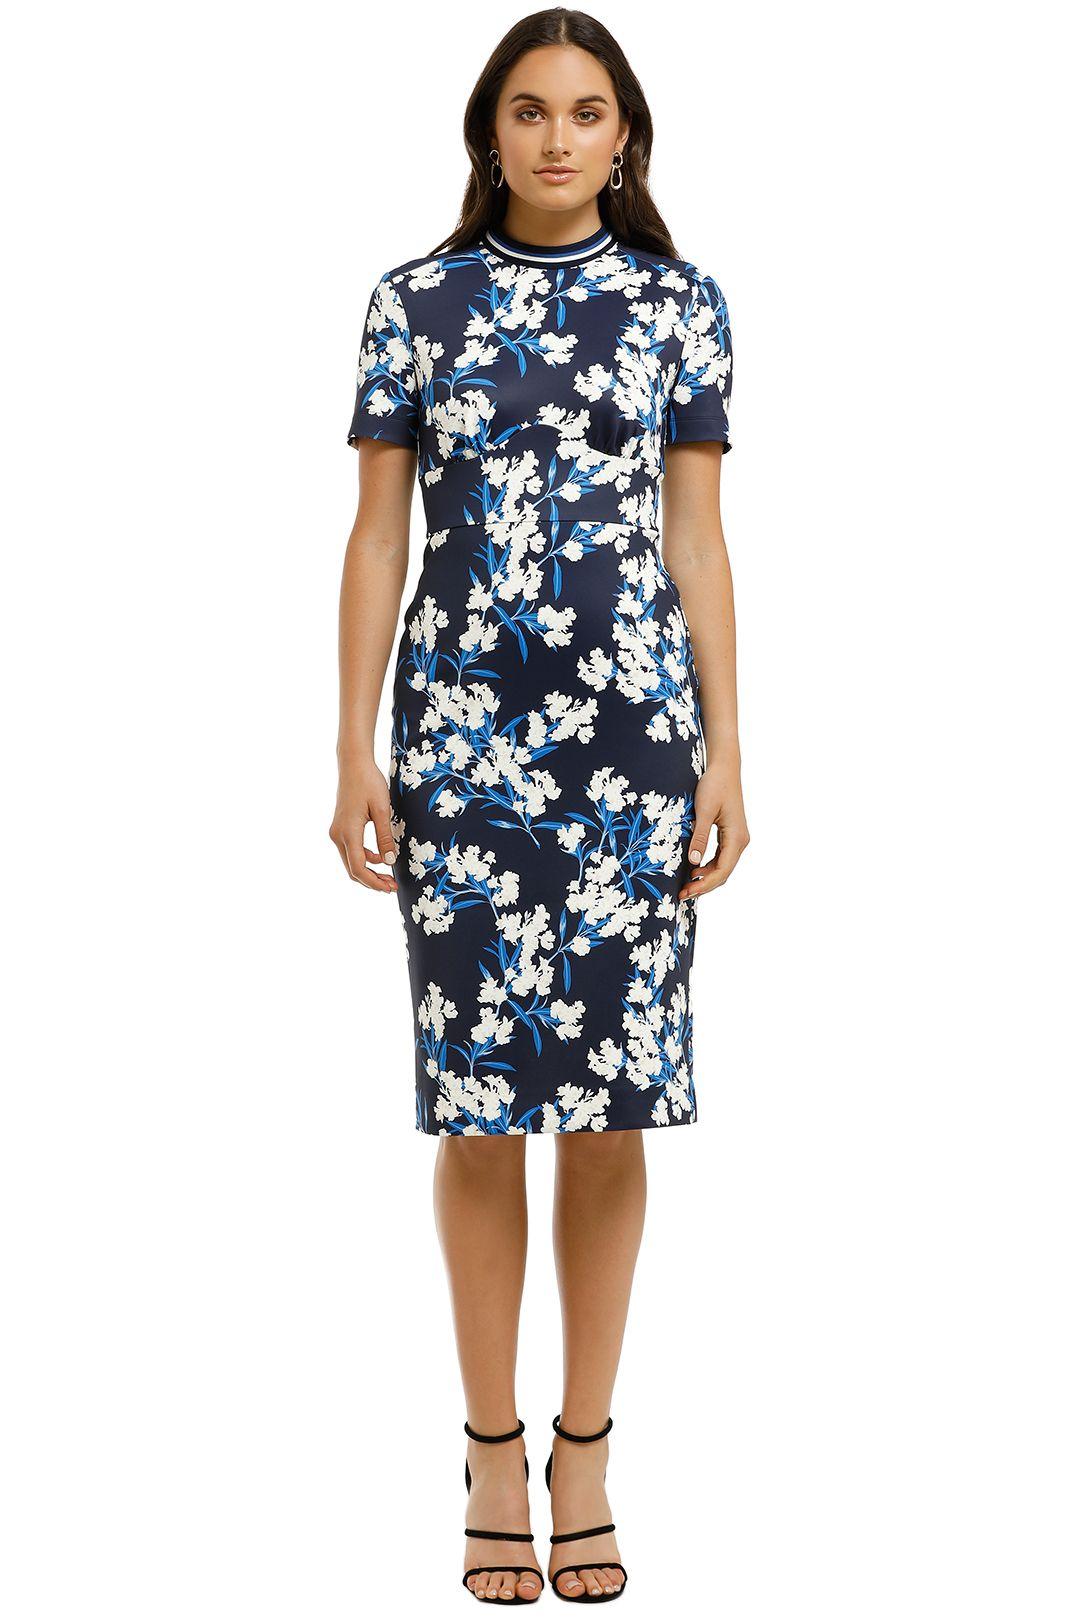 Lover-Mystic-Sheath-Dress-Floral-Blue-Front